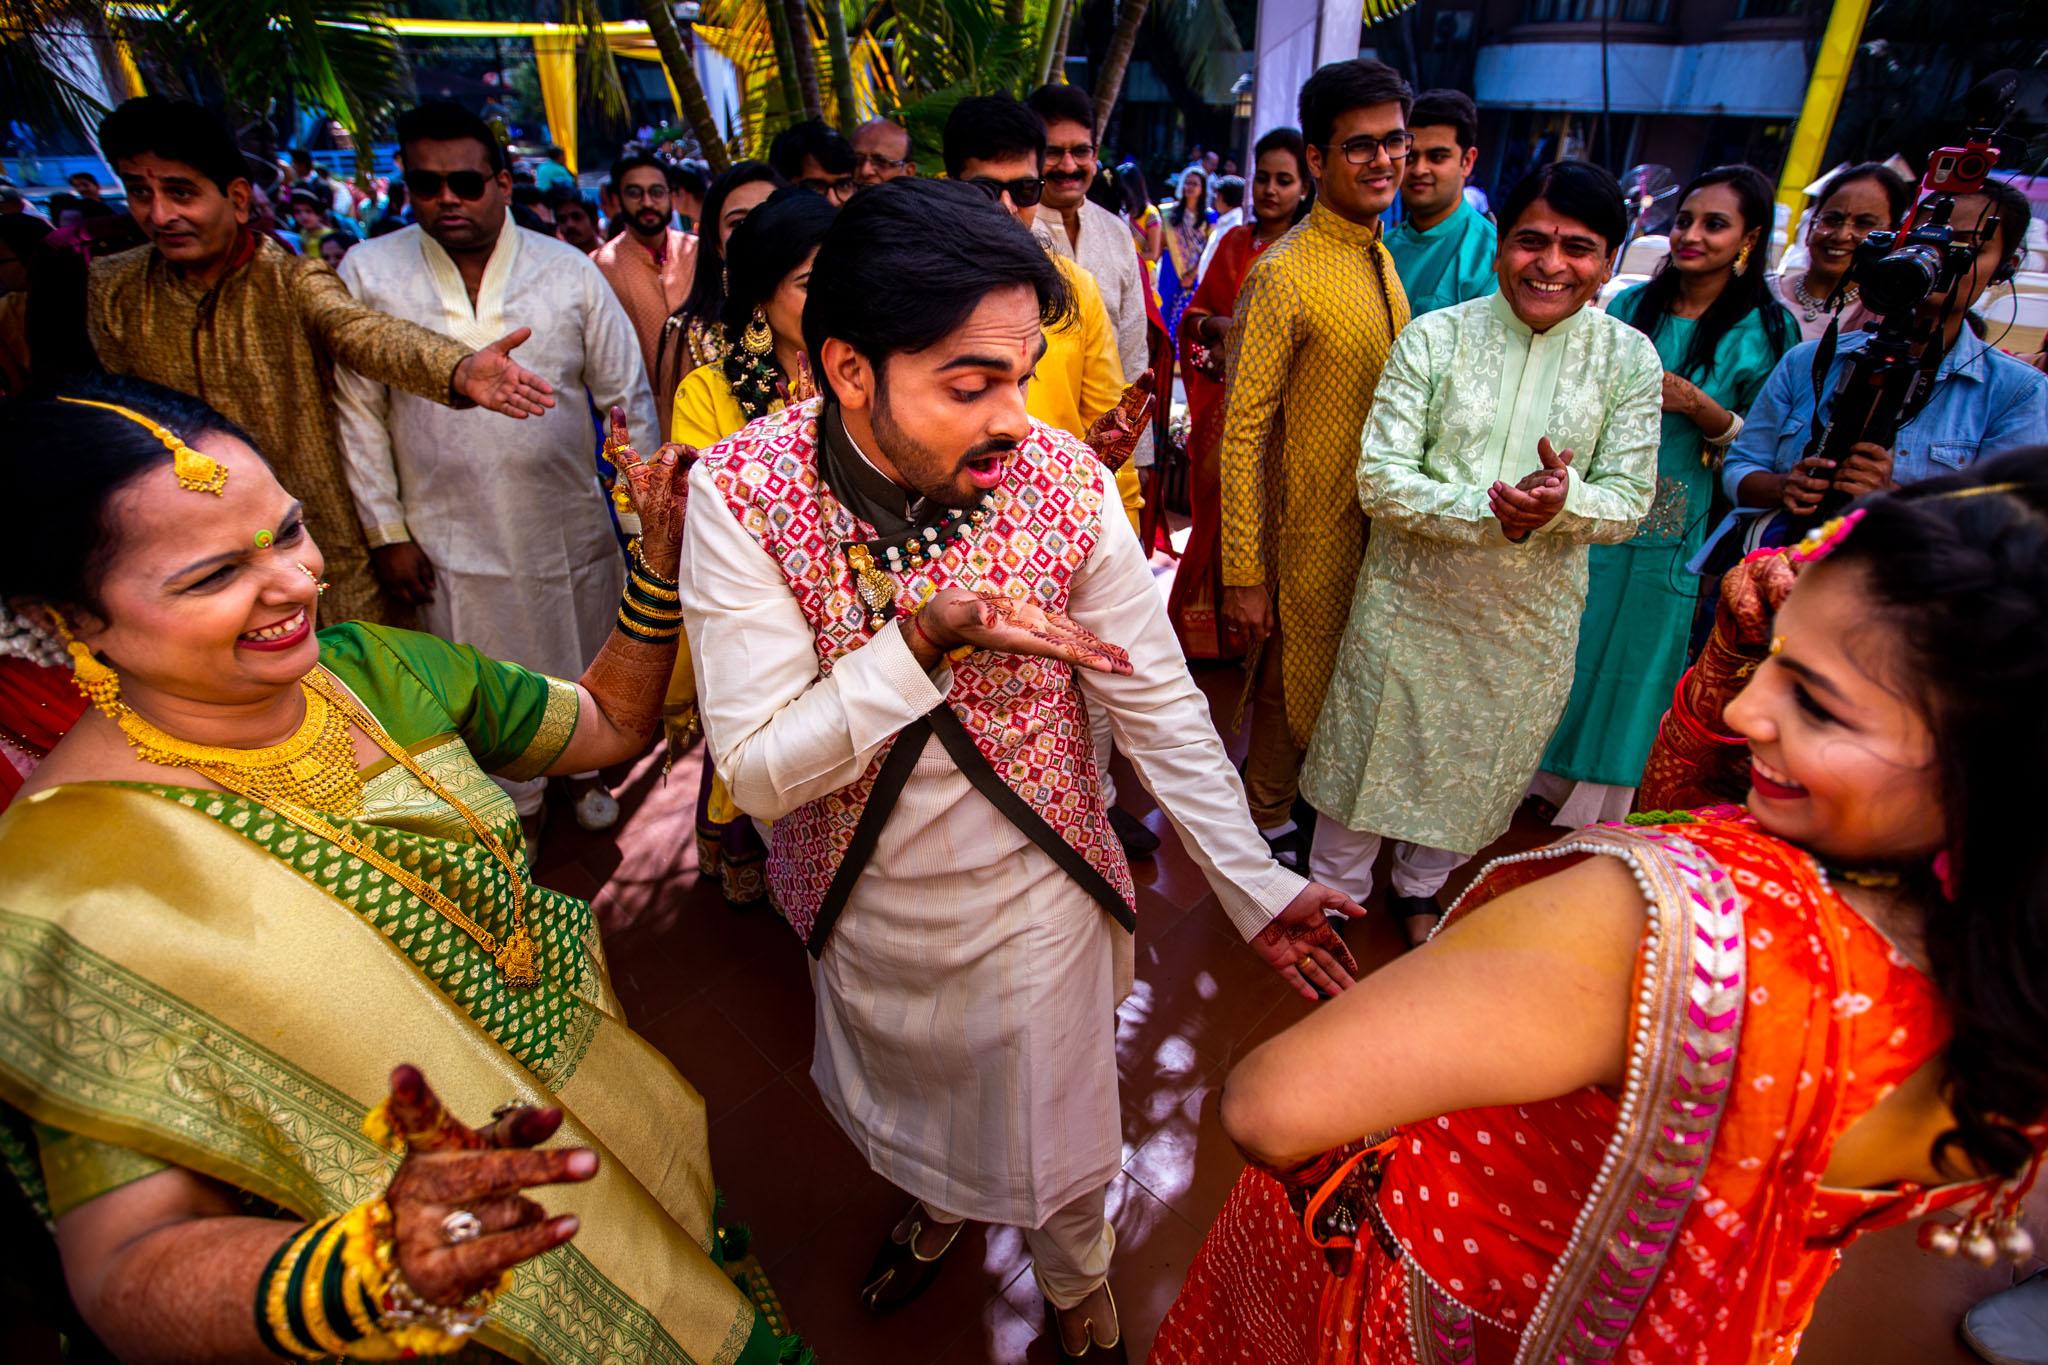 Mukti x Ojas Wedding Akshjay Sansare Photography Best wedding photographer in mumbai India Candid Cinematic Films videos-7.jpg